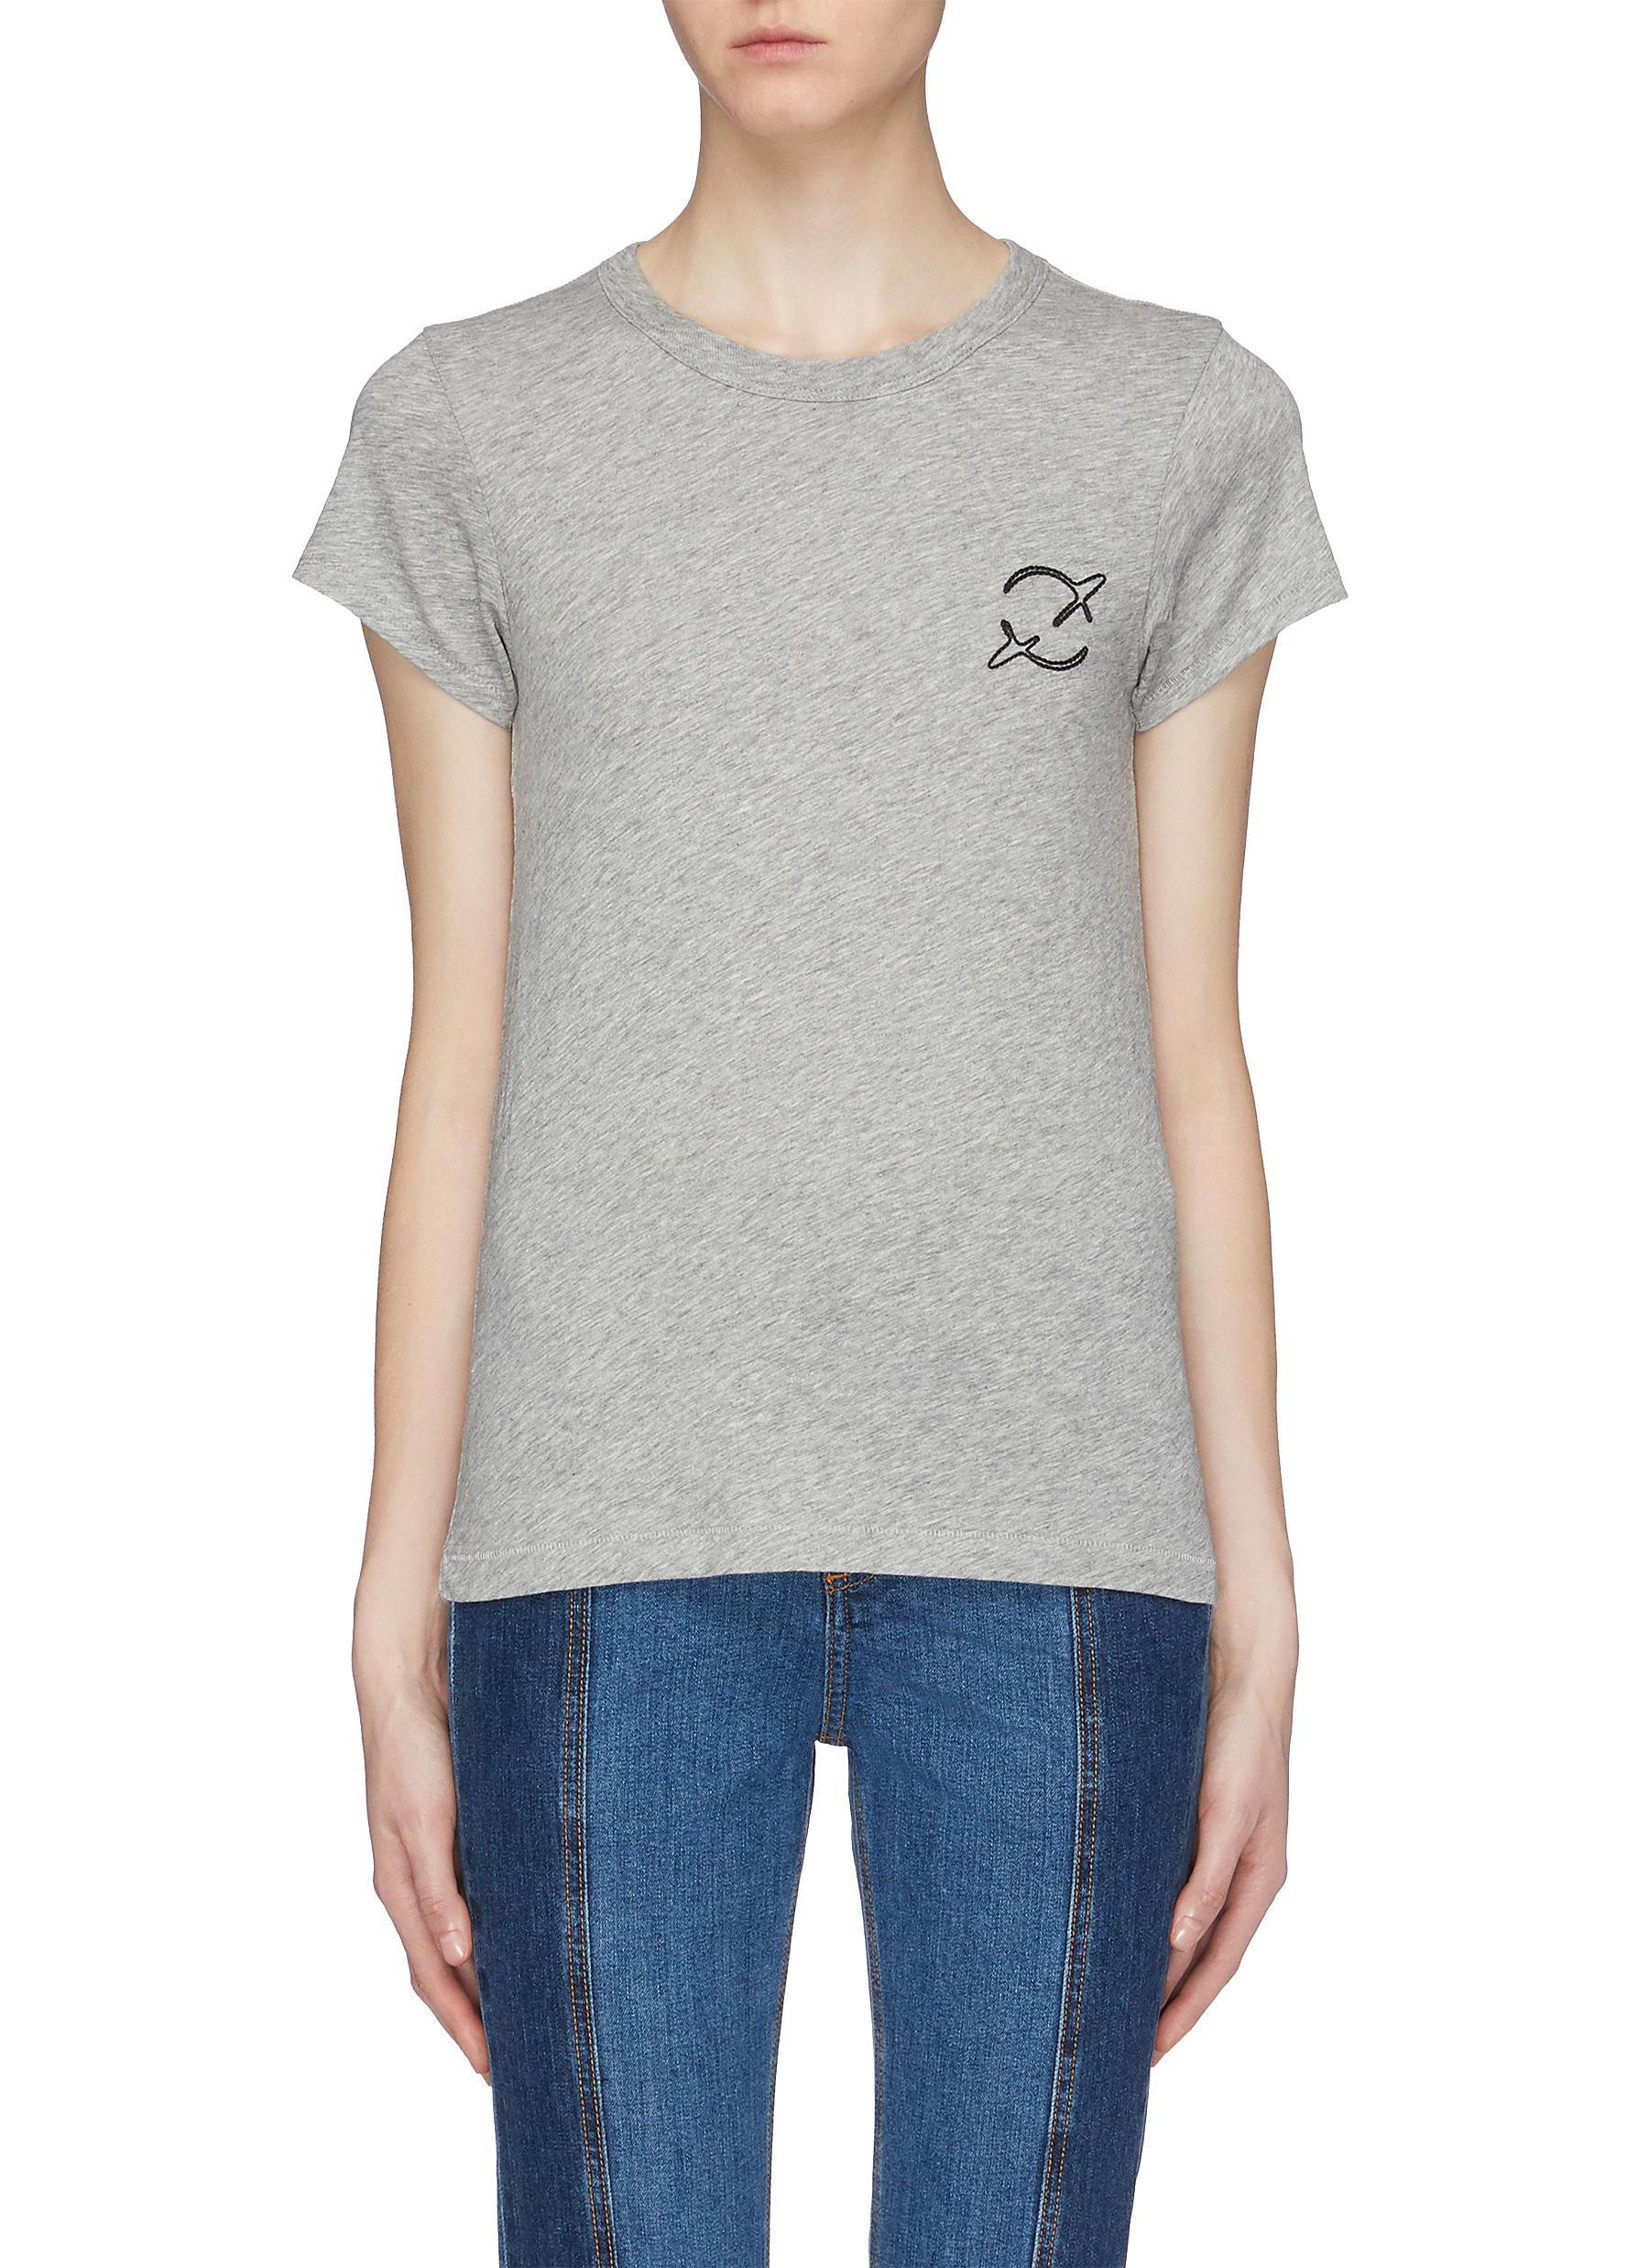 Rag Bonejean Planet Embroidered Pima Cotton Slub Jersey T Shirt